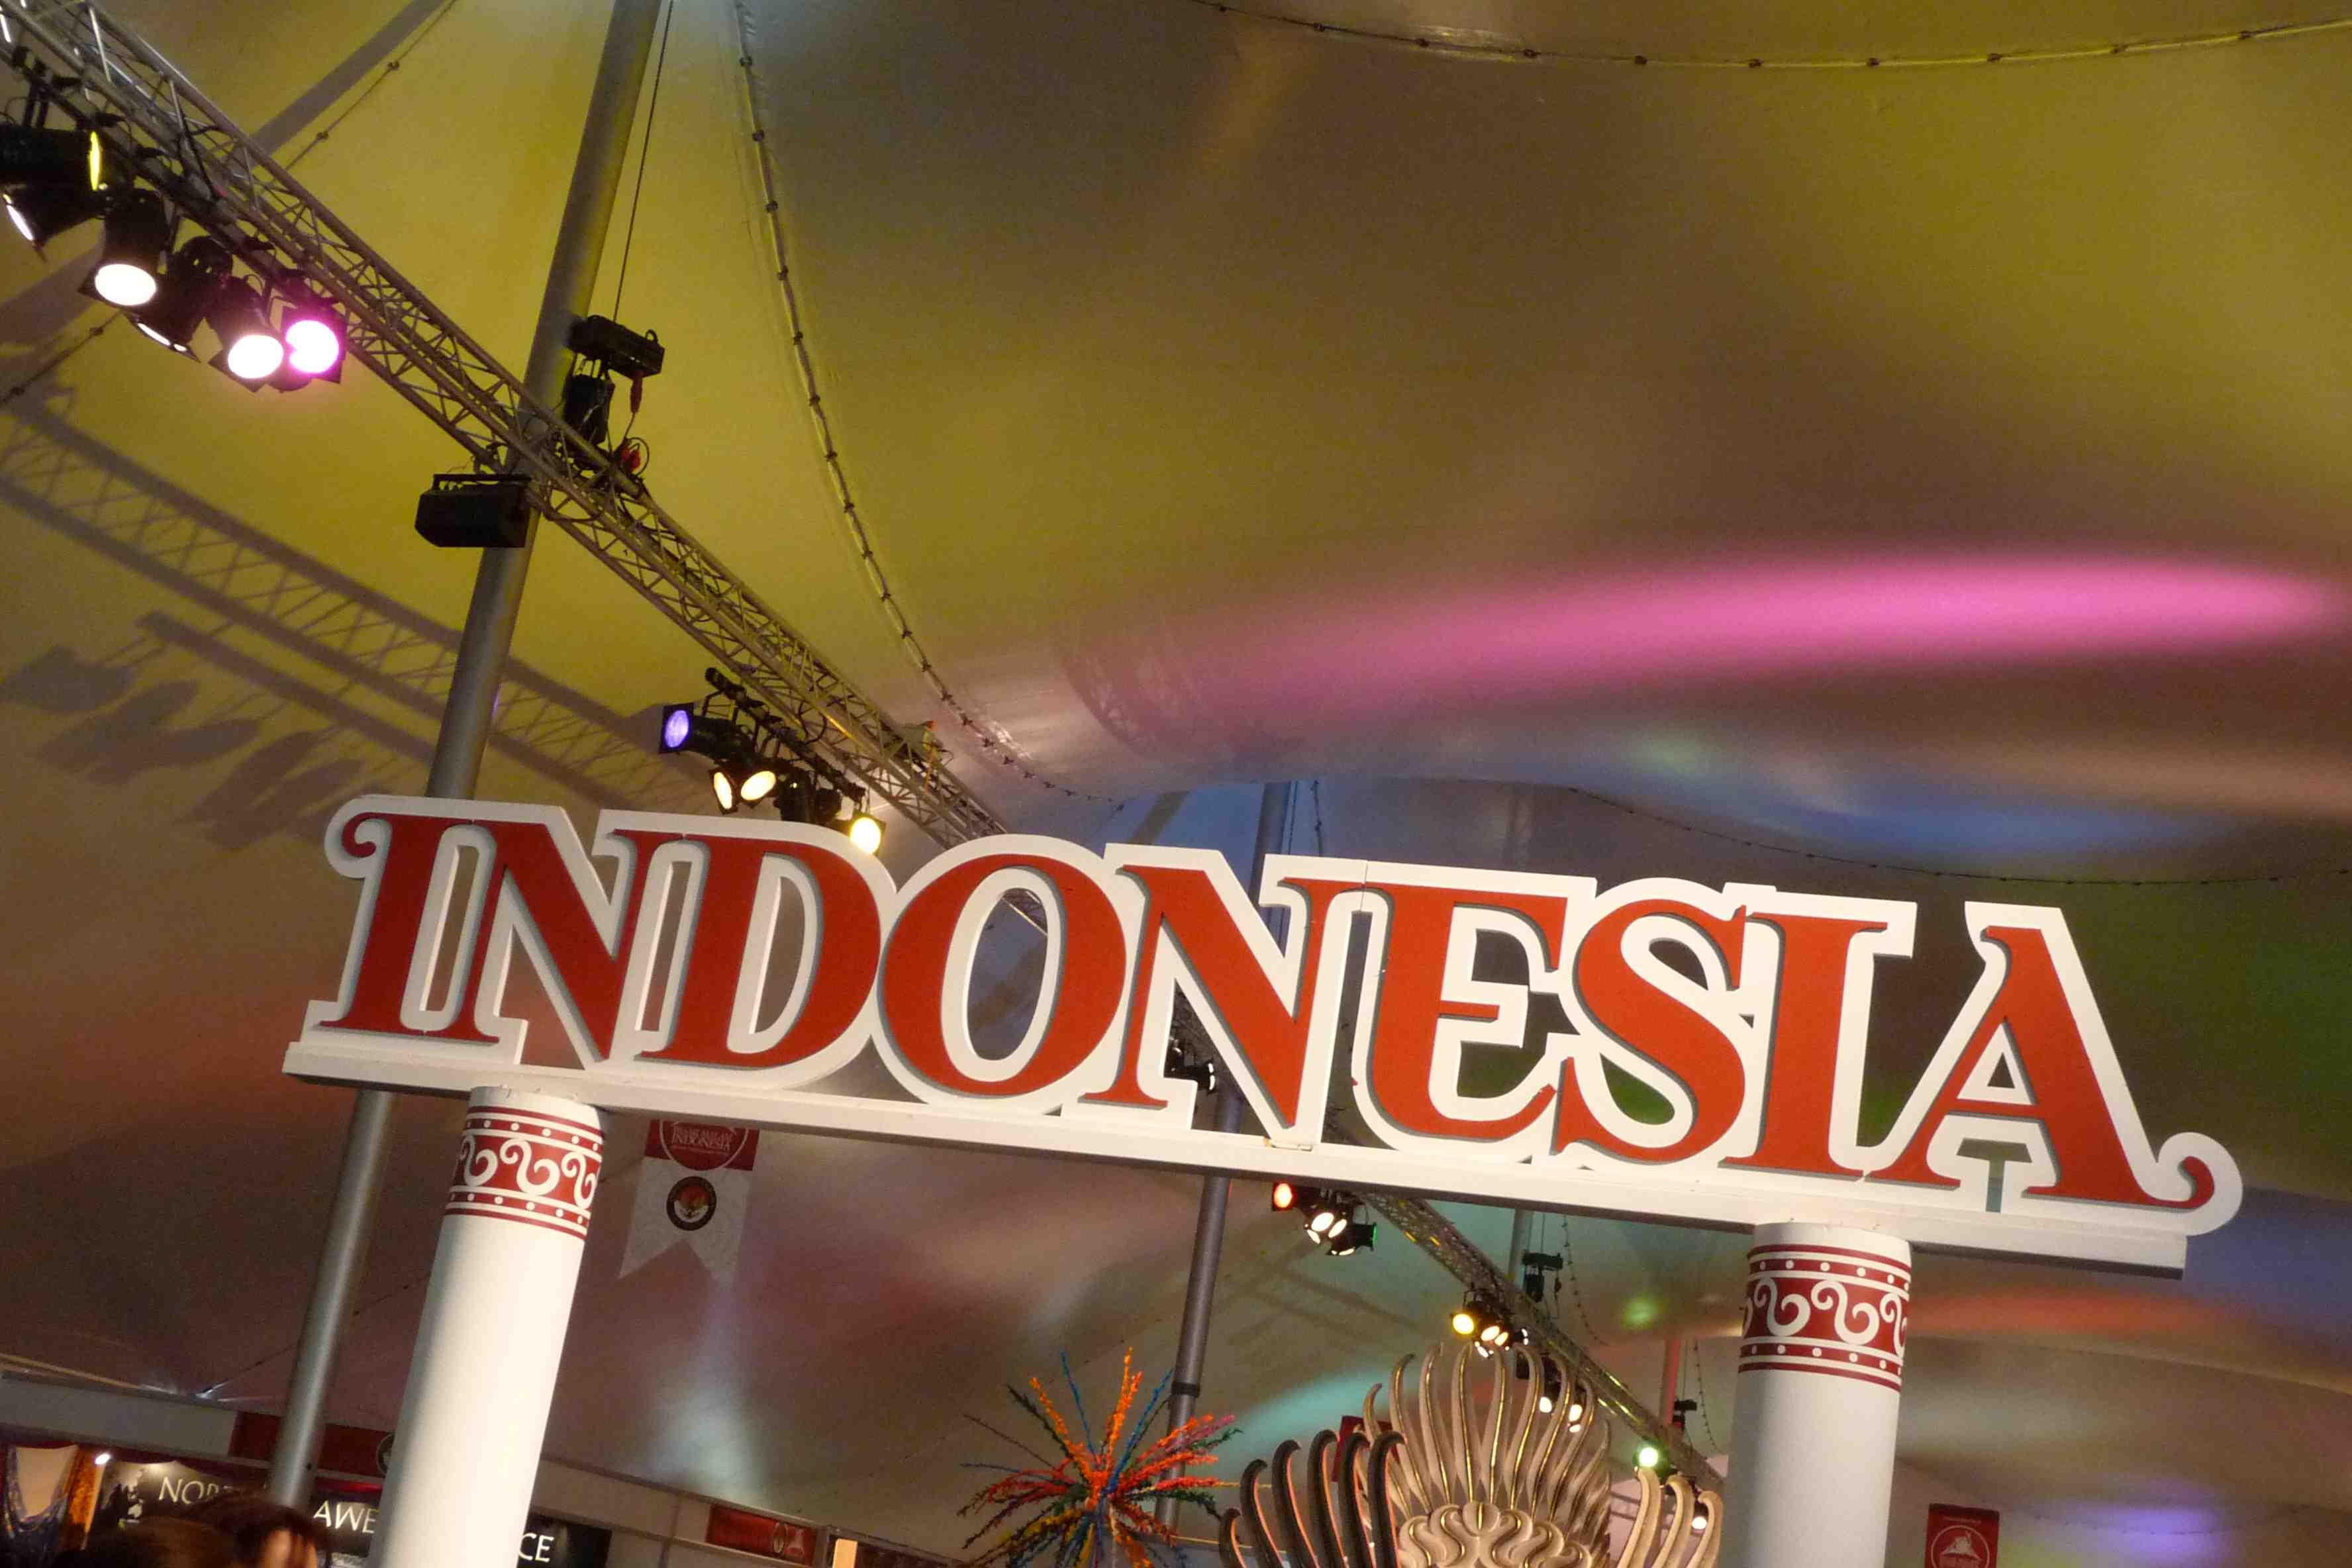 pasar malam indonesia 2011 (c) Kirsten Vos/ Indisch3.0